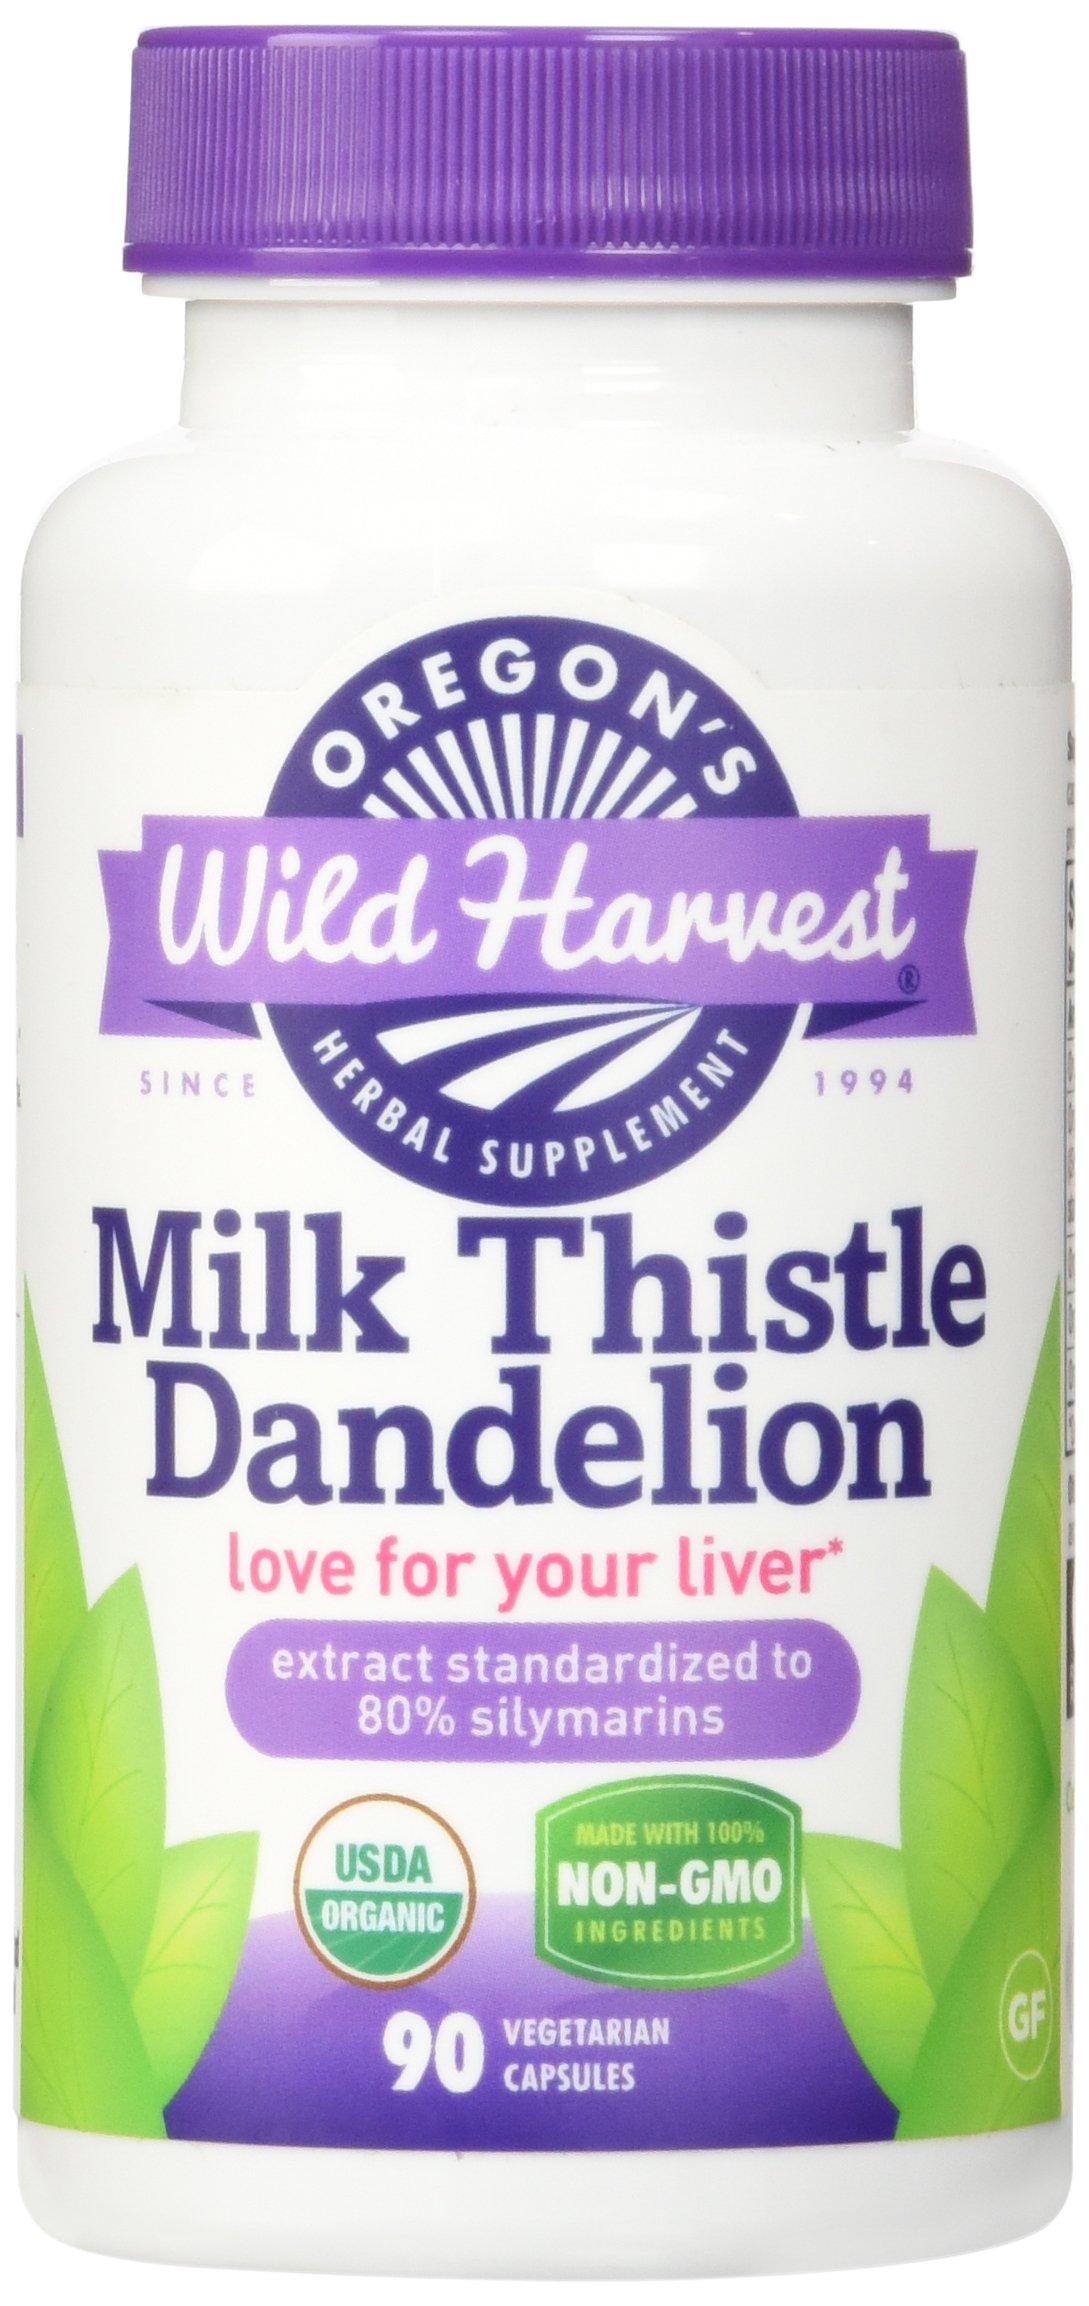 Oregon's Wild Harvest Milk Thistle Dandelion Supplement, 90 Count vegetarian capsules